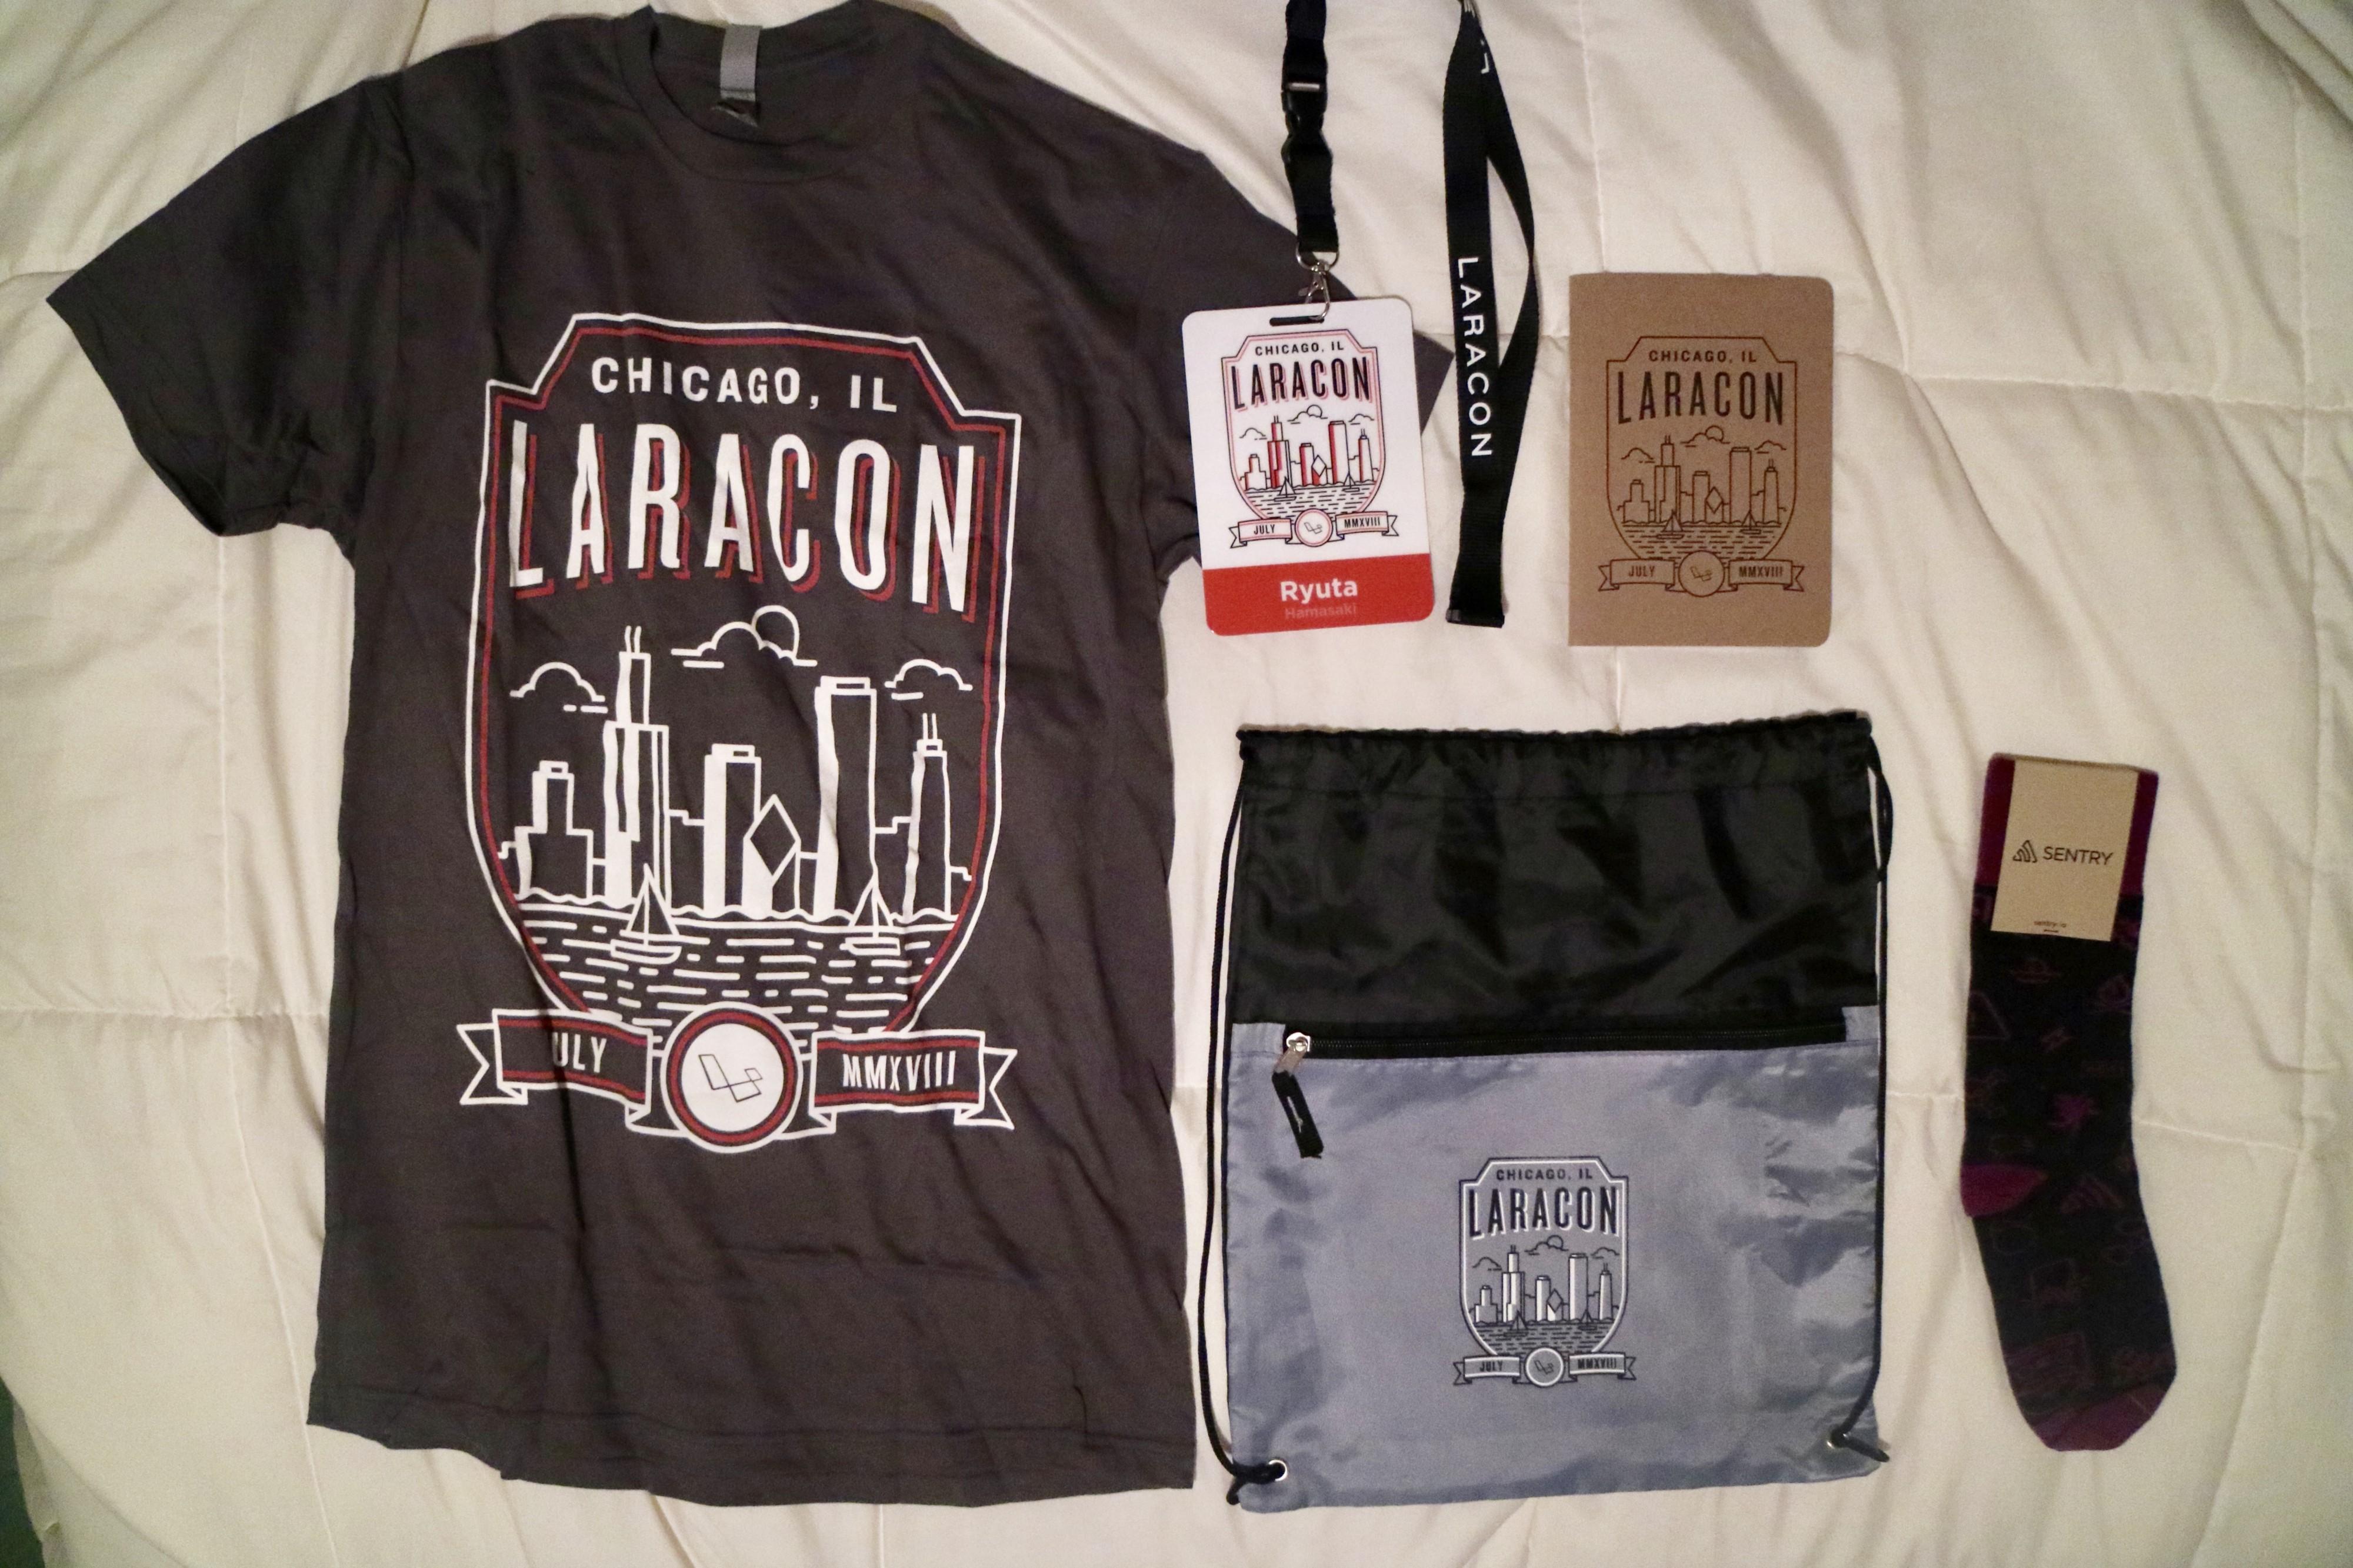 Laracon swags